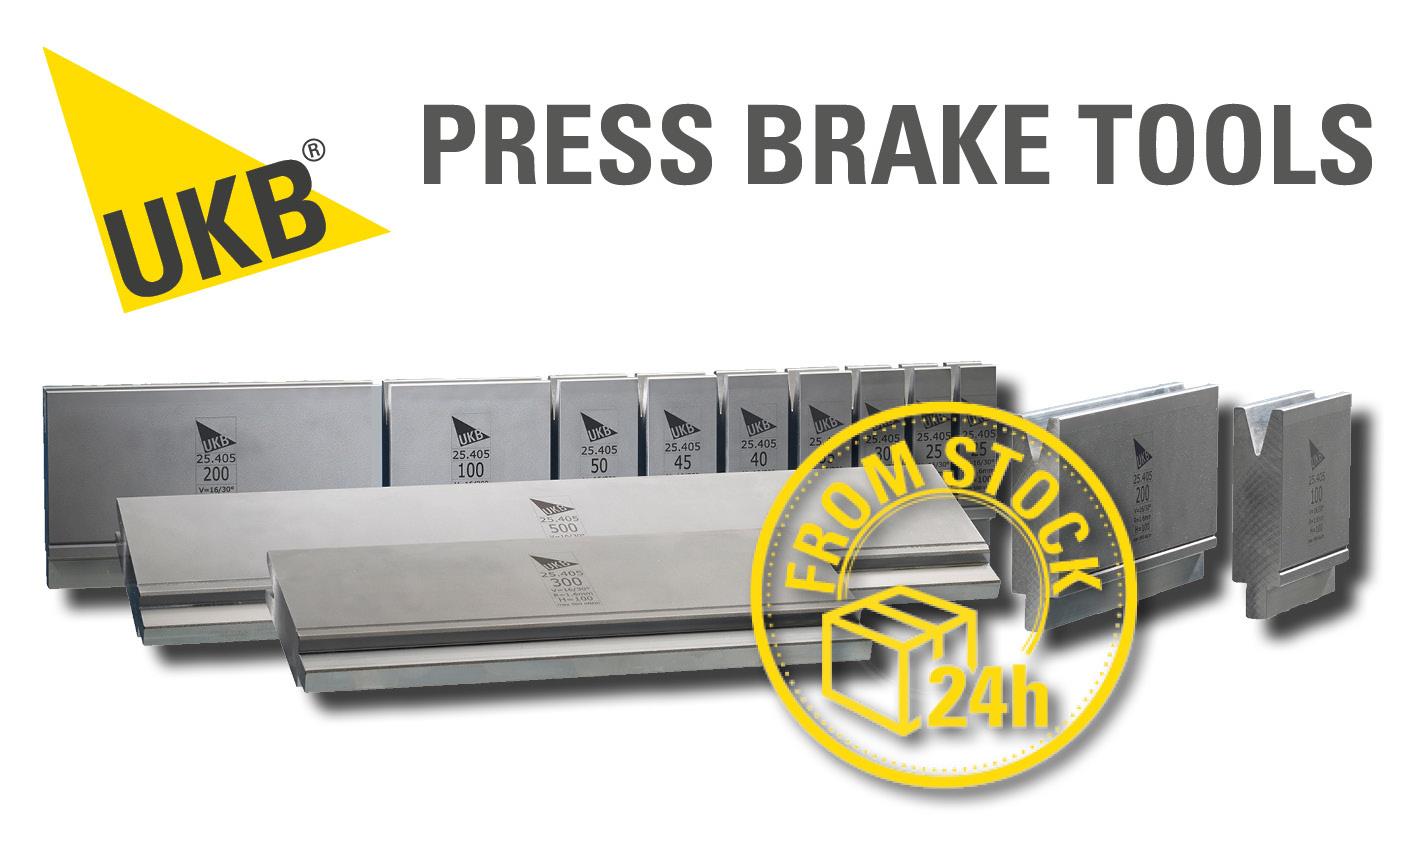 UKB-Press brake tools